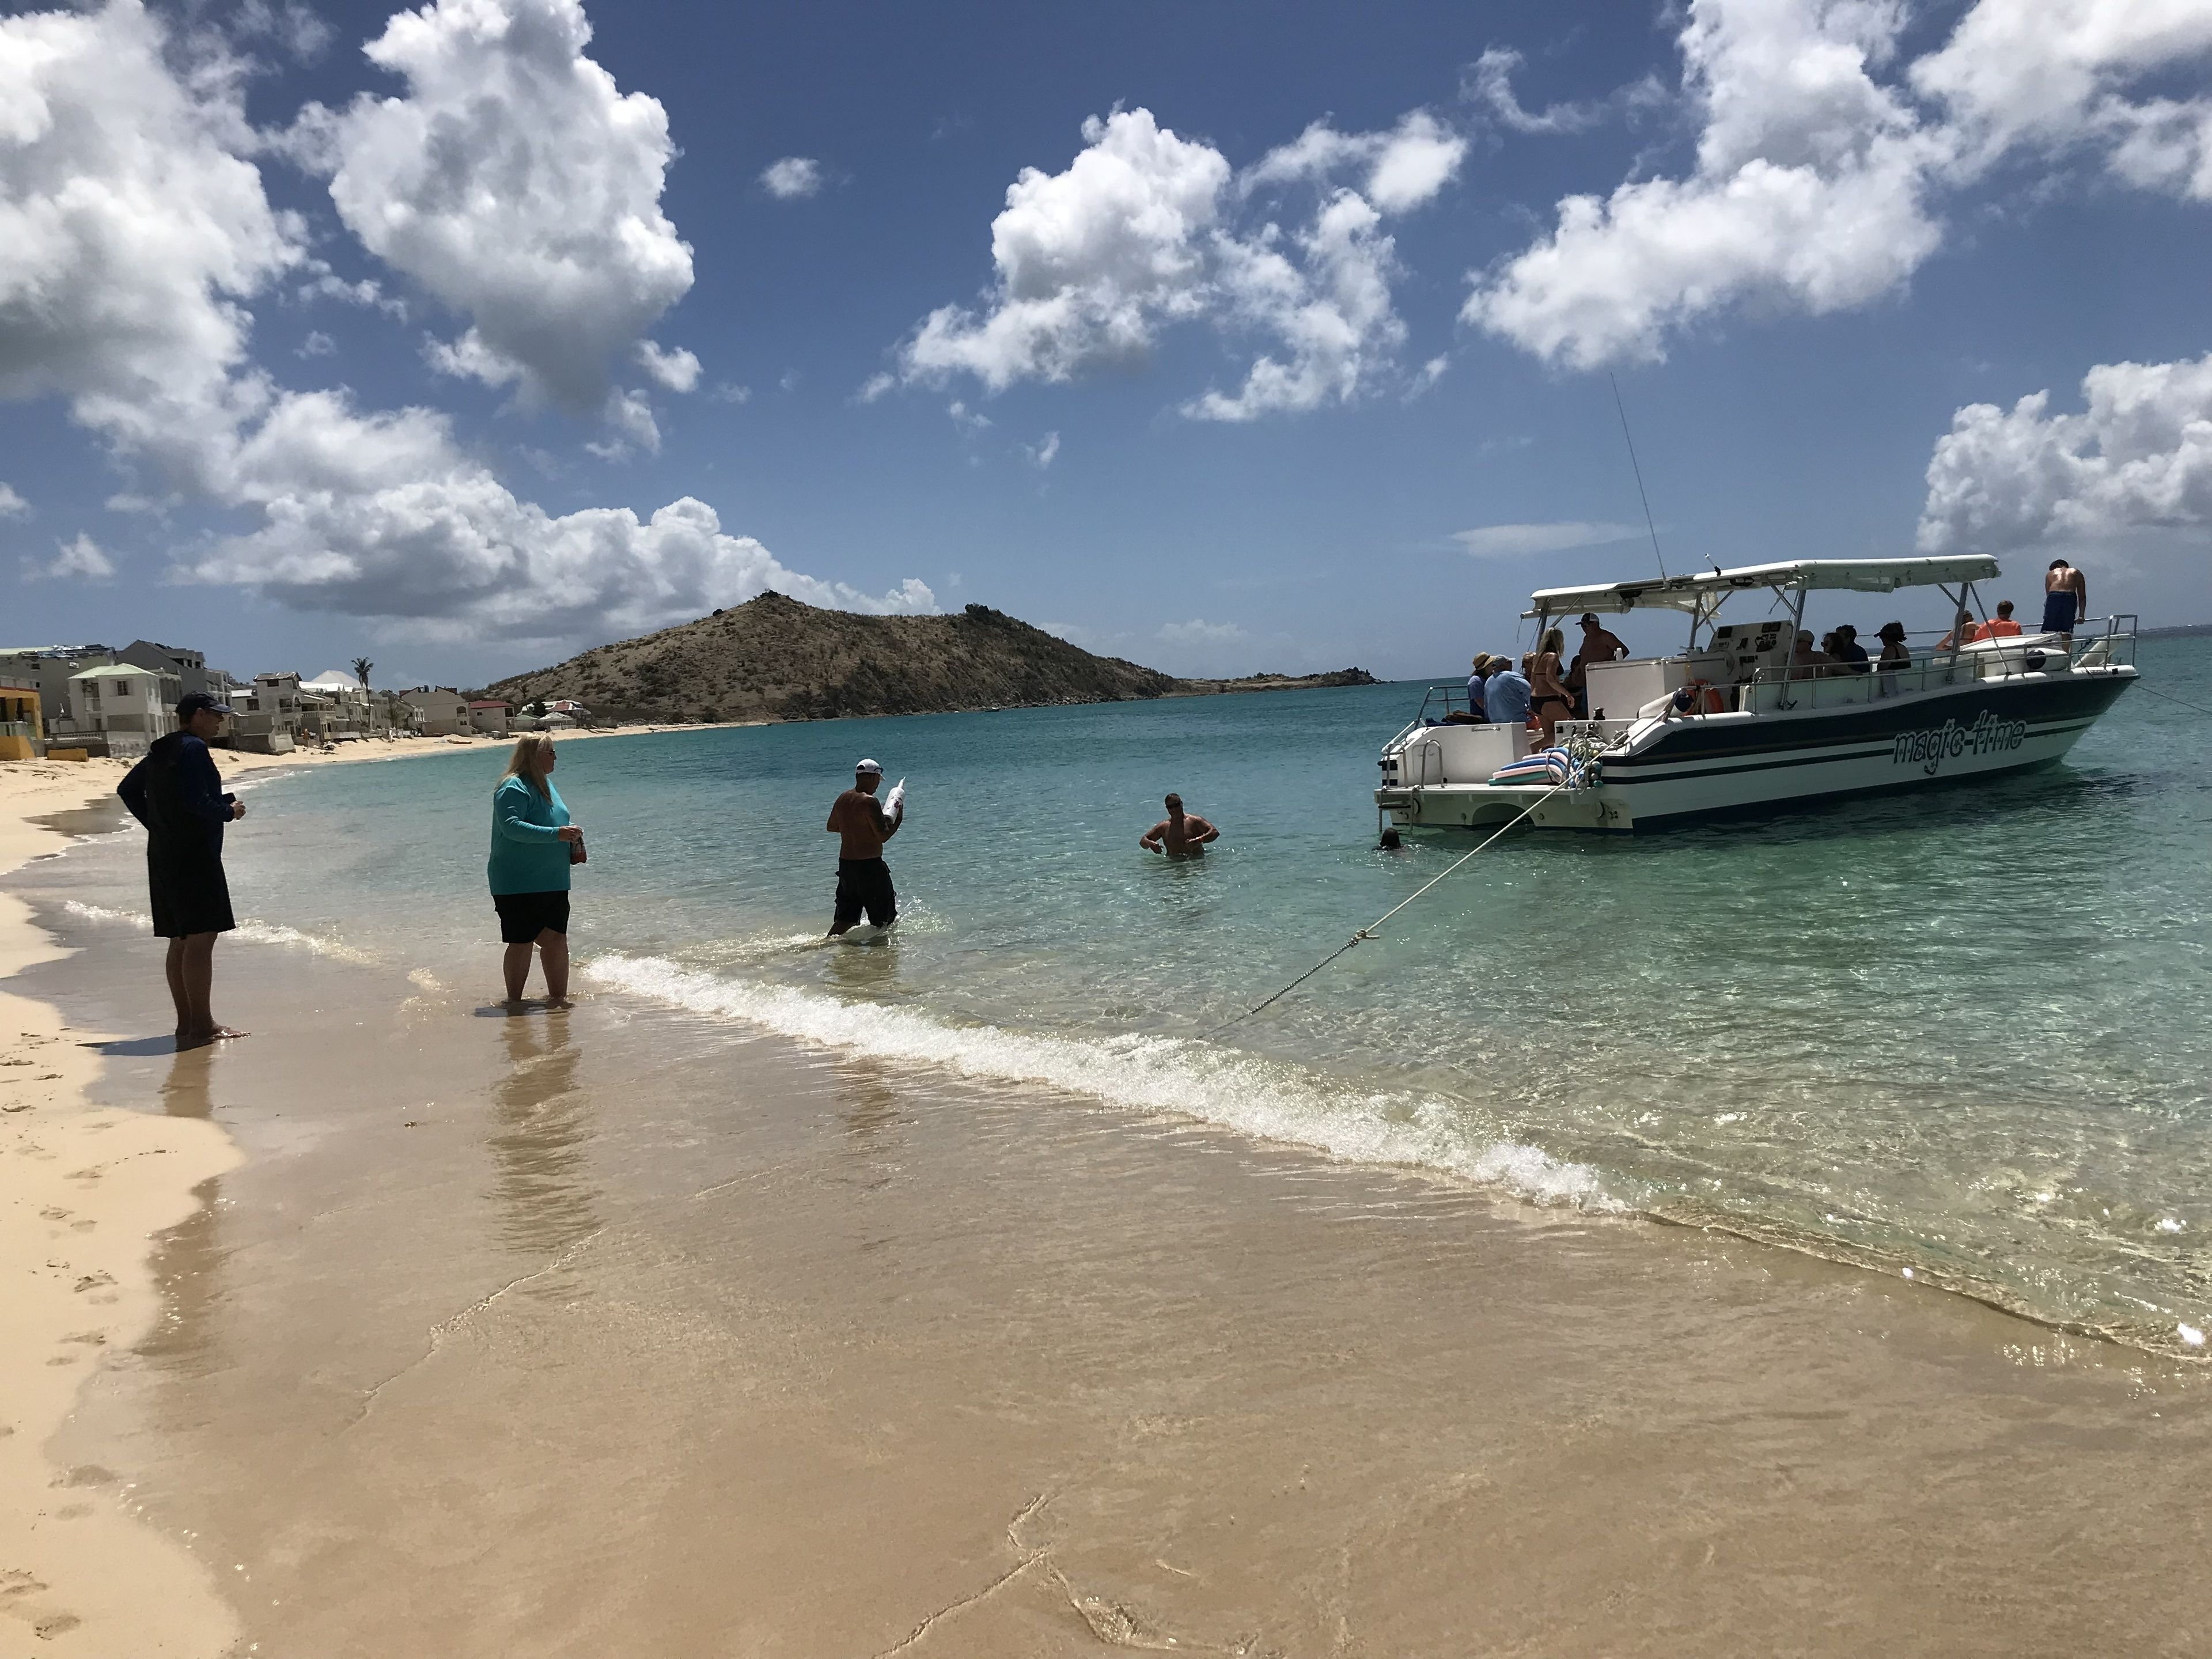 Ultimate Eco Tour Snorkeling, Sightseeing on Power Catamaran